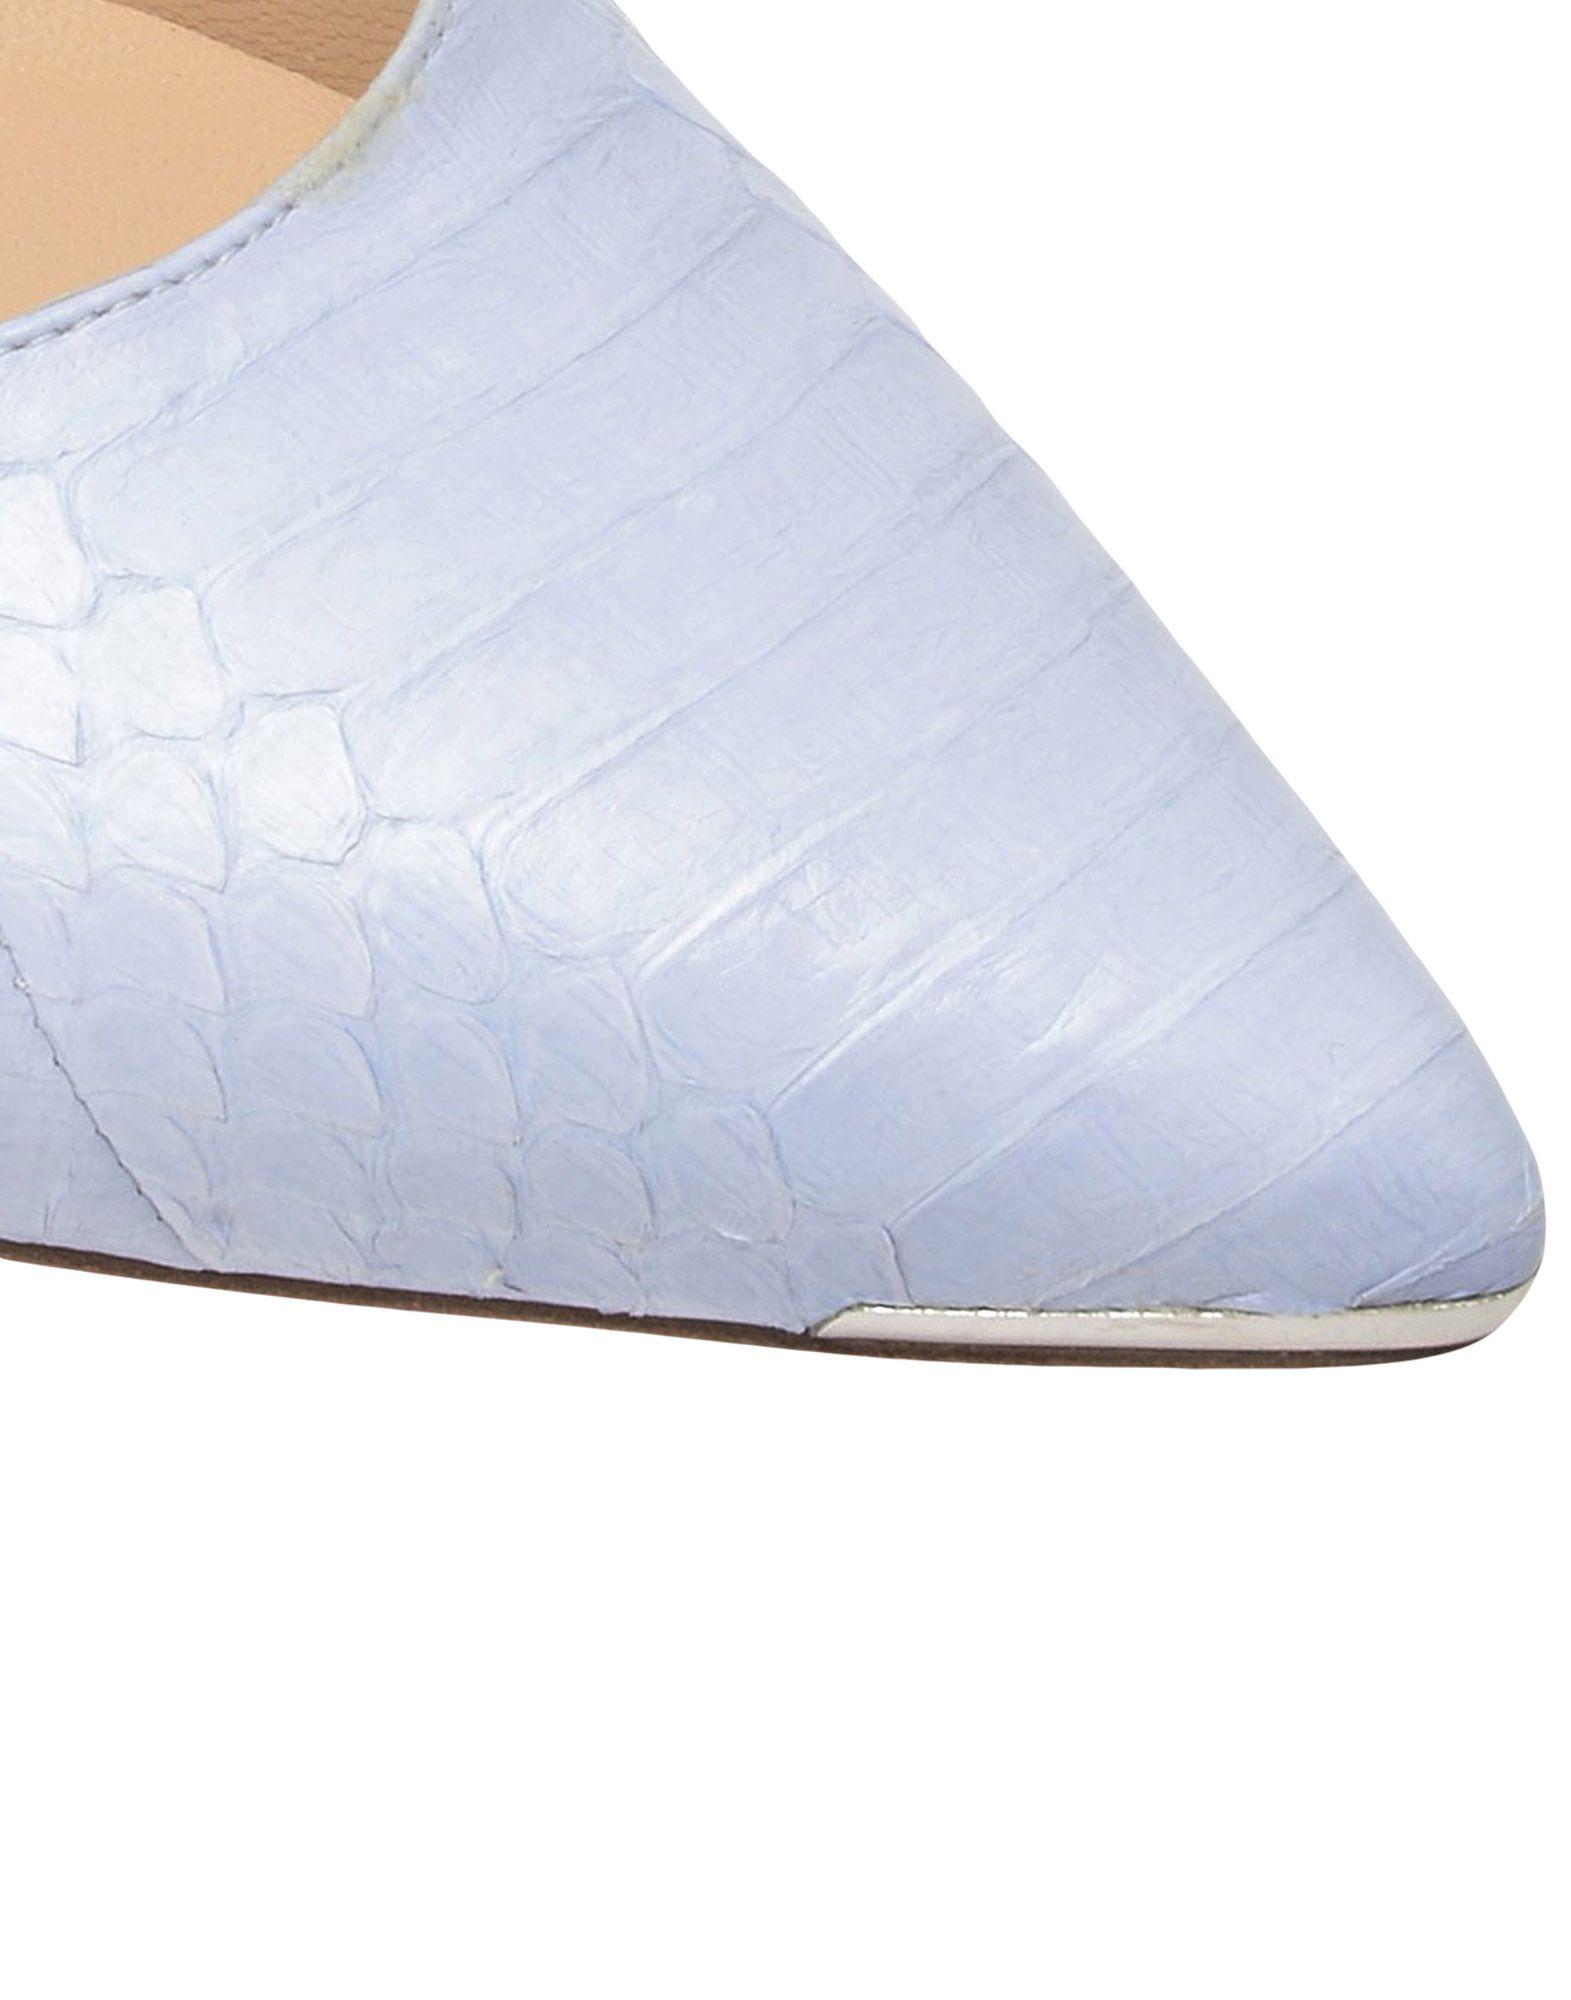 Rabatt Collection Schuhe Michael Kors Collection Rabatt Pumps Damen  11446203NI 0f813b